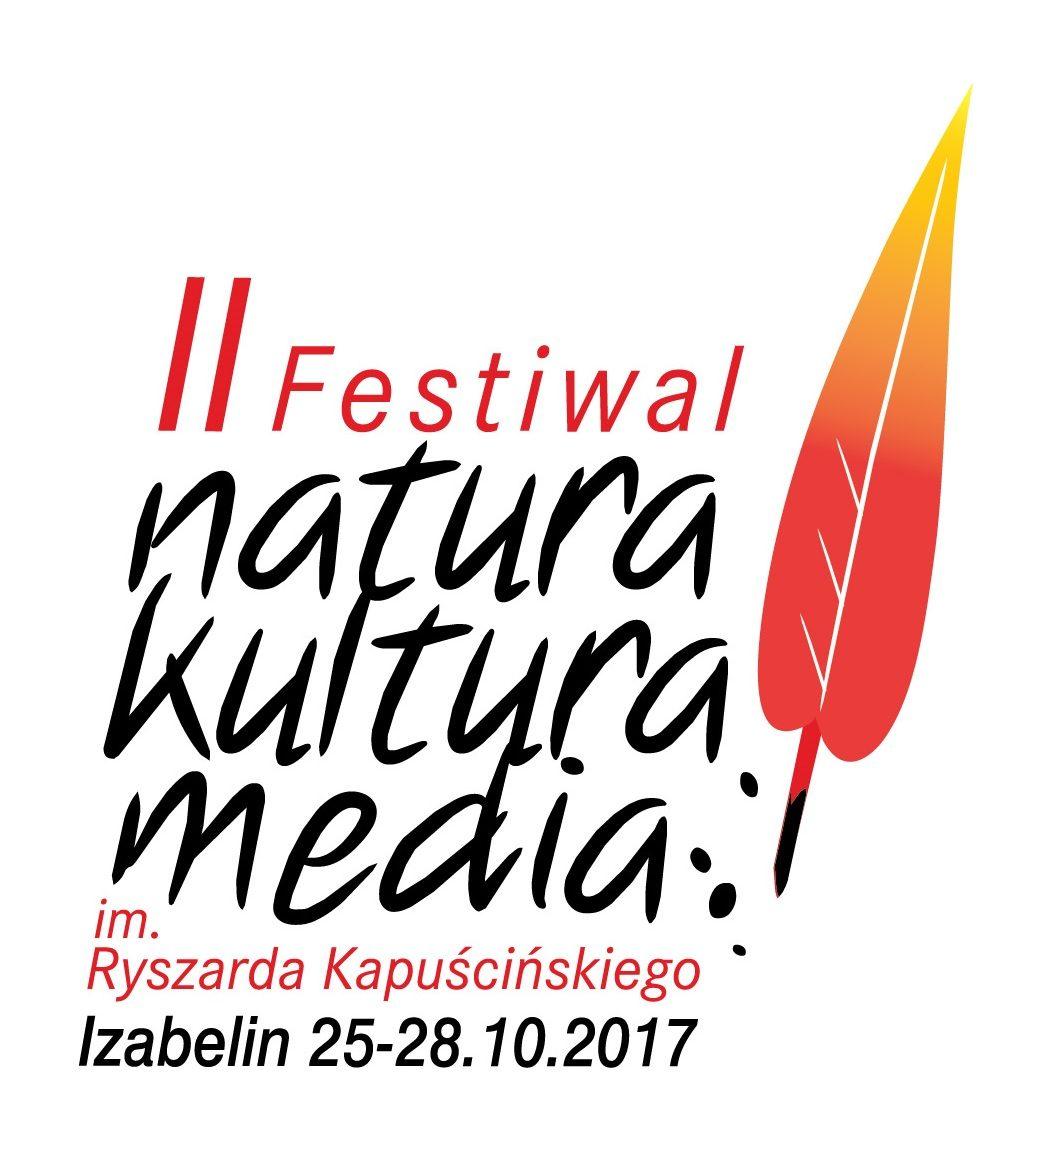 Festiwal Natura - Kultura - Media im. Ryszarda Kapuścińskiego